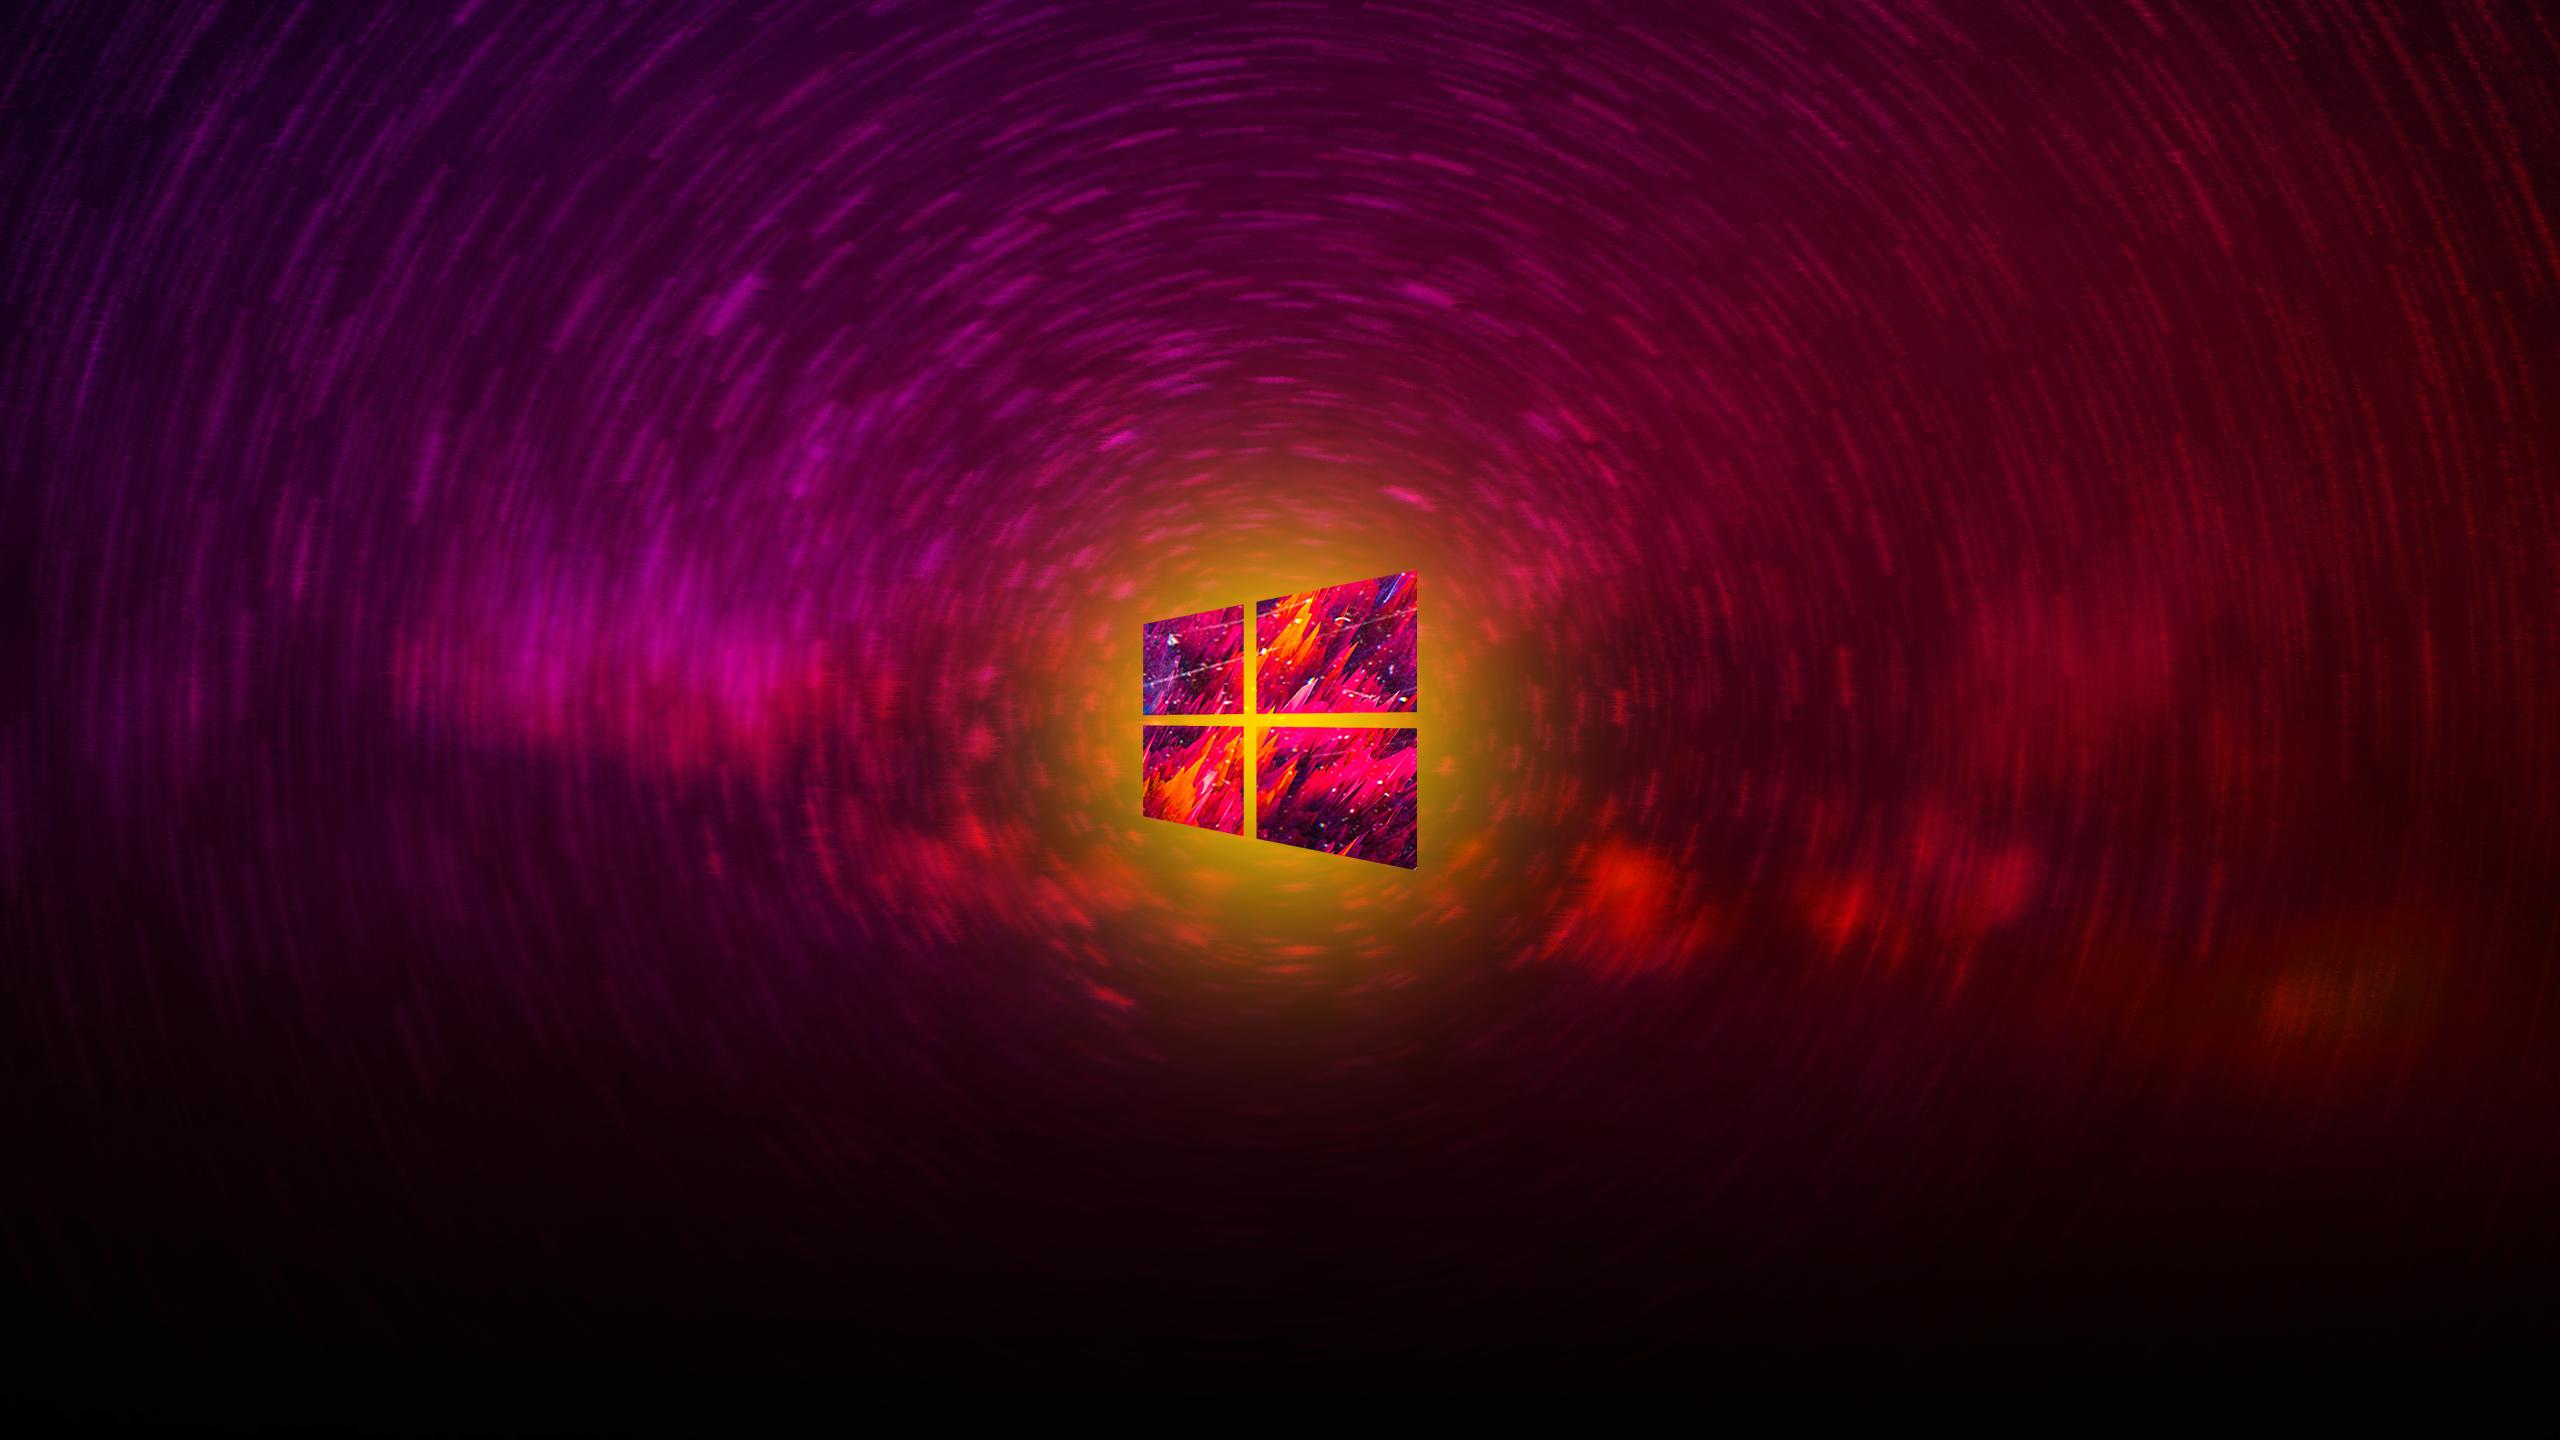 Wallpaper Windows 10 Microsoft Universe Sun Rays 2560x1440 Ekin 1954987 Hd Wallpapers Wallhere